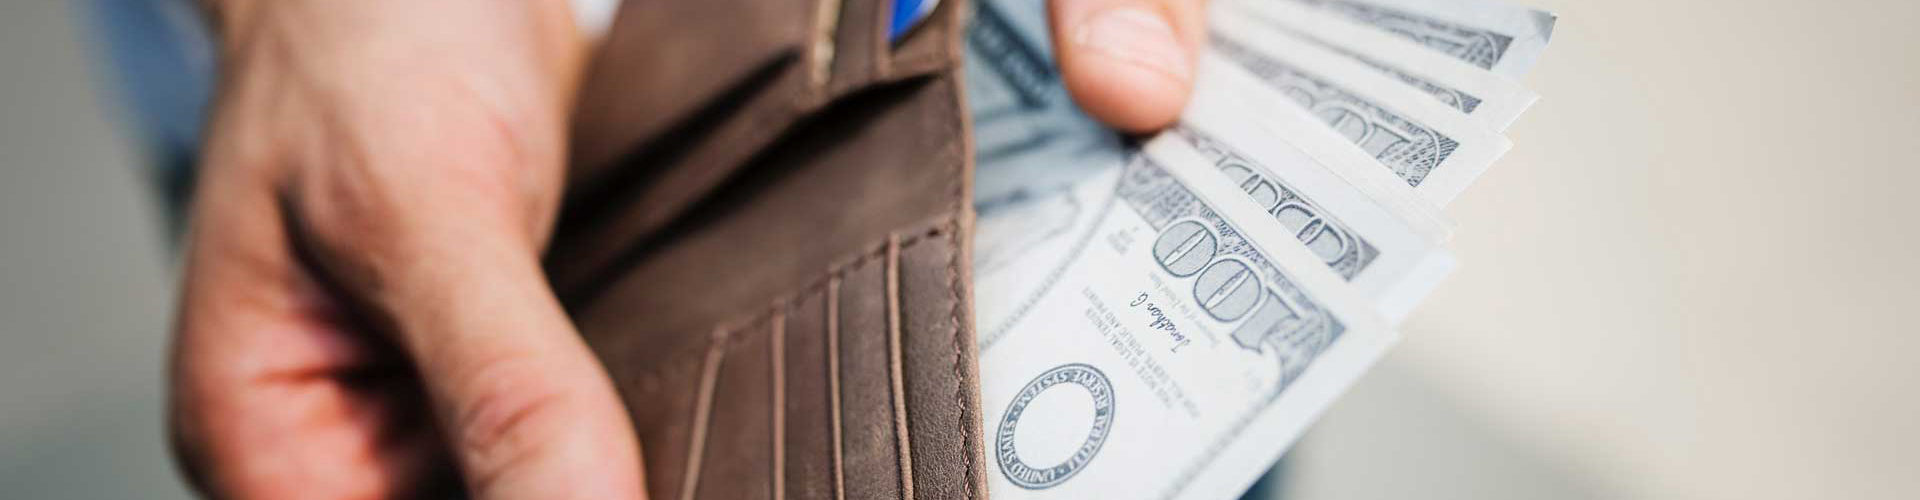 Man holding dollar bills getting security deposit back